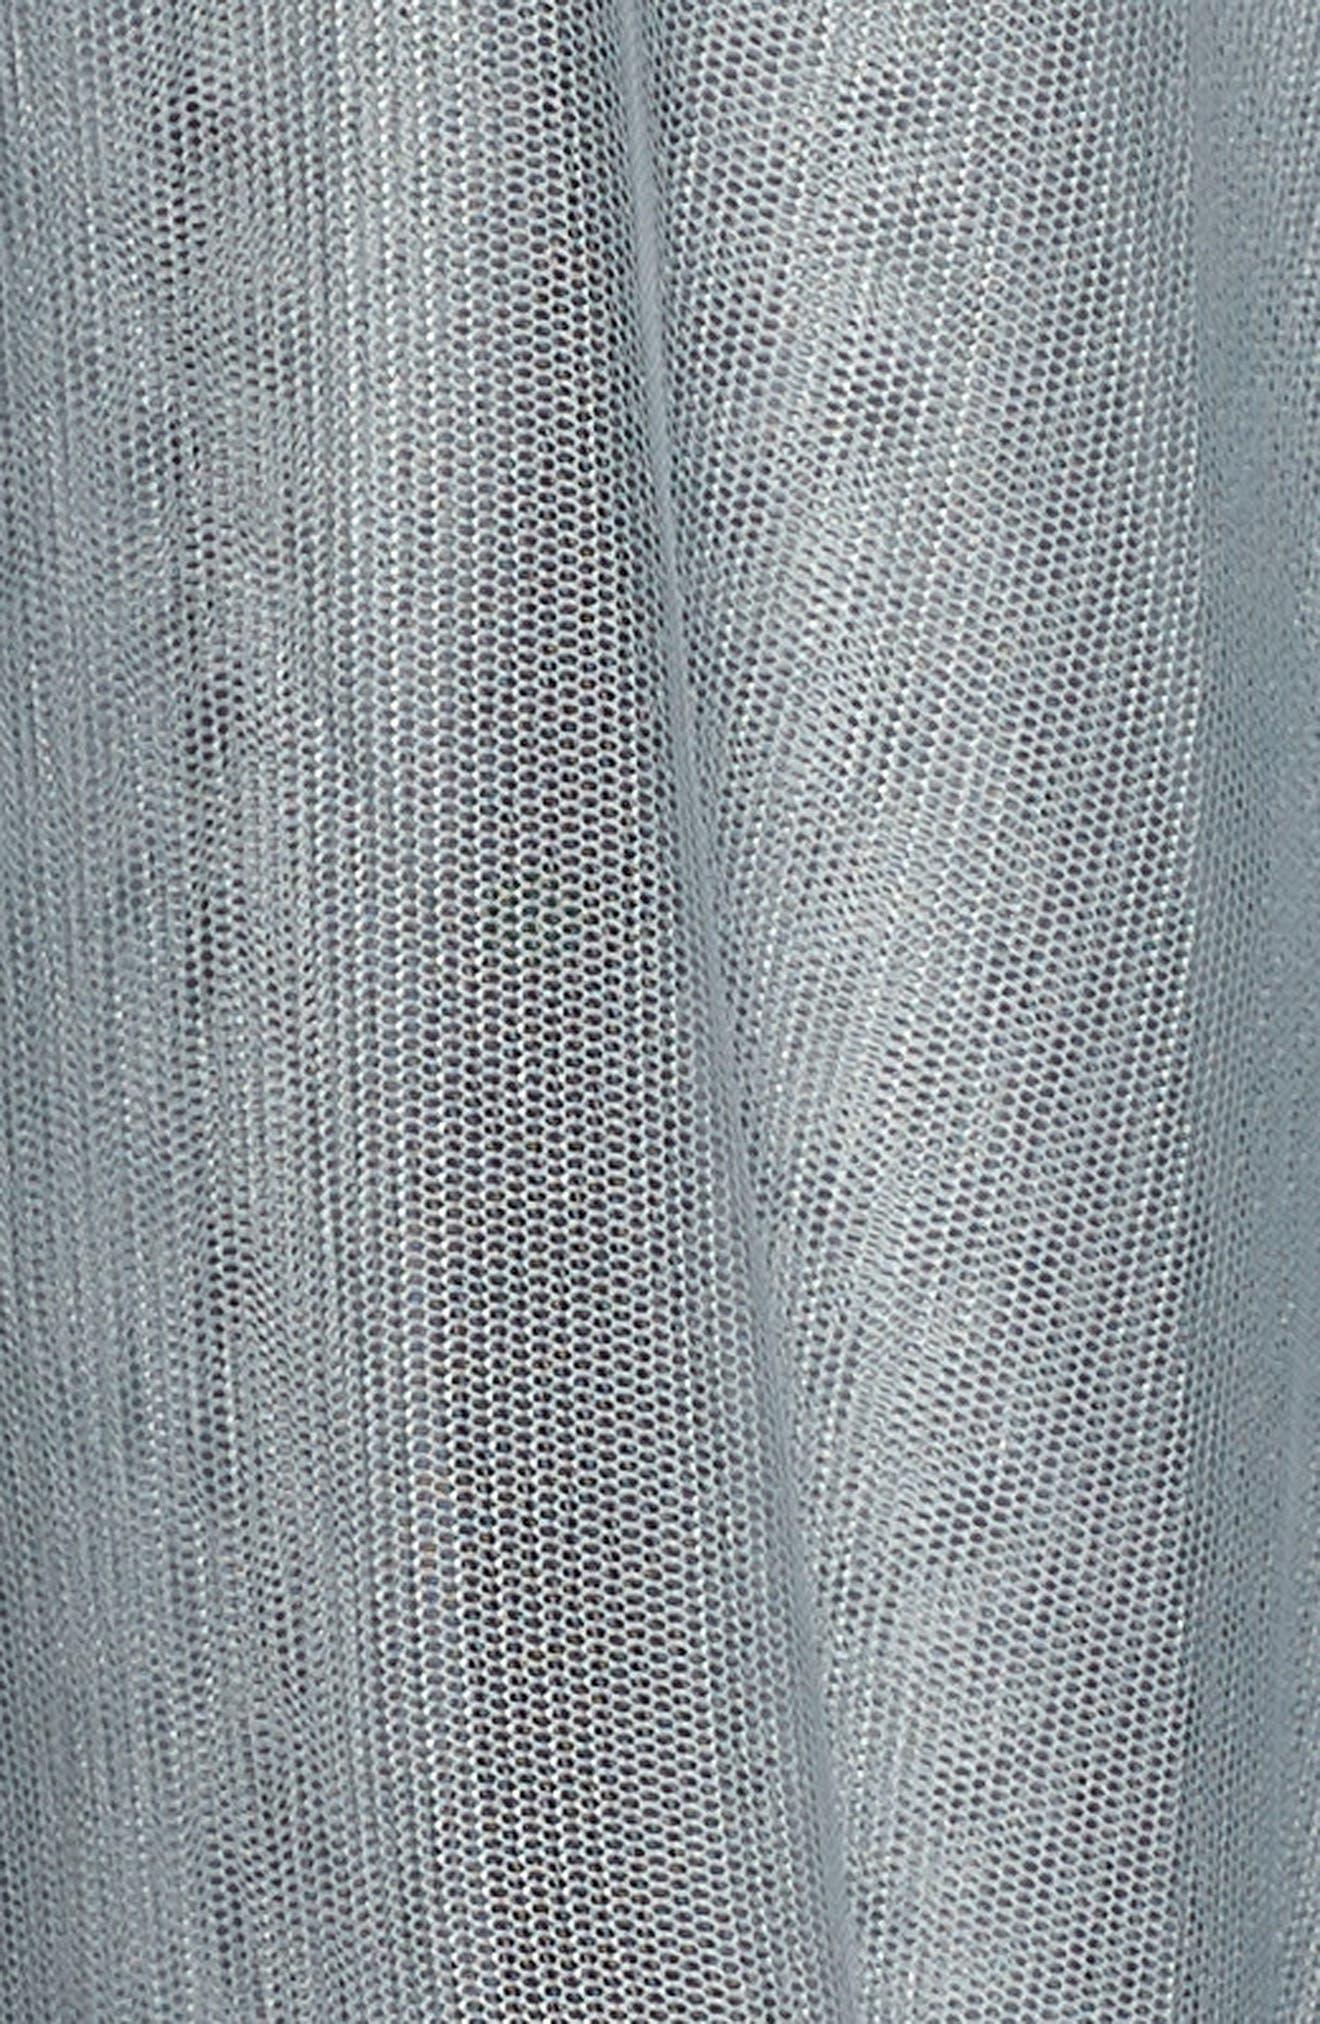 Bridget Embellished Tiered Tulle Dress,                             Alternate thumbnail 5, color,                             GREY